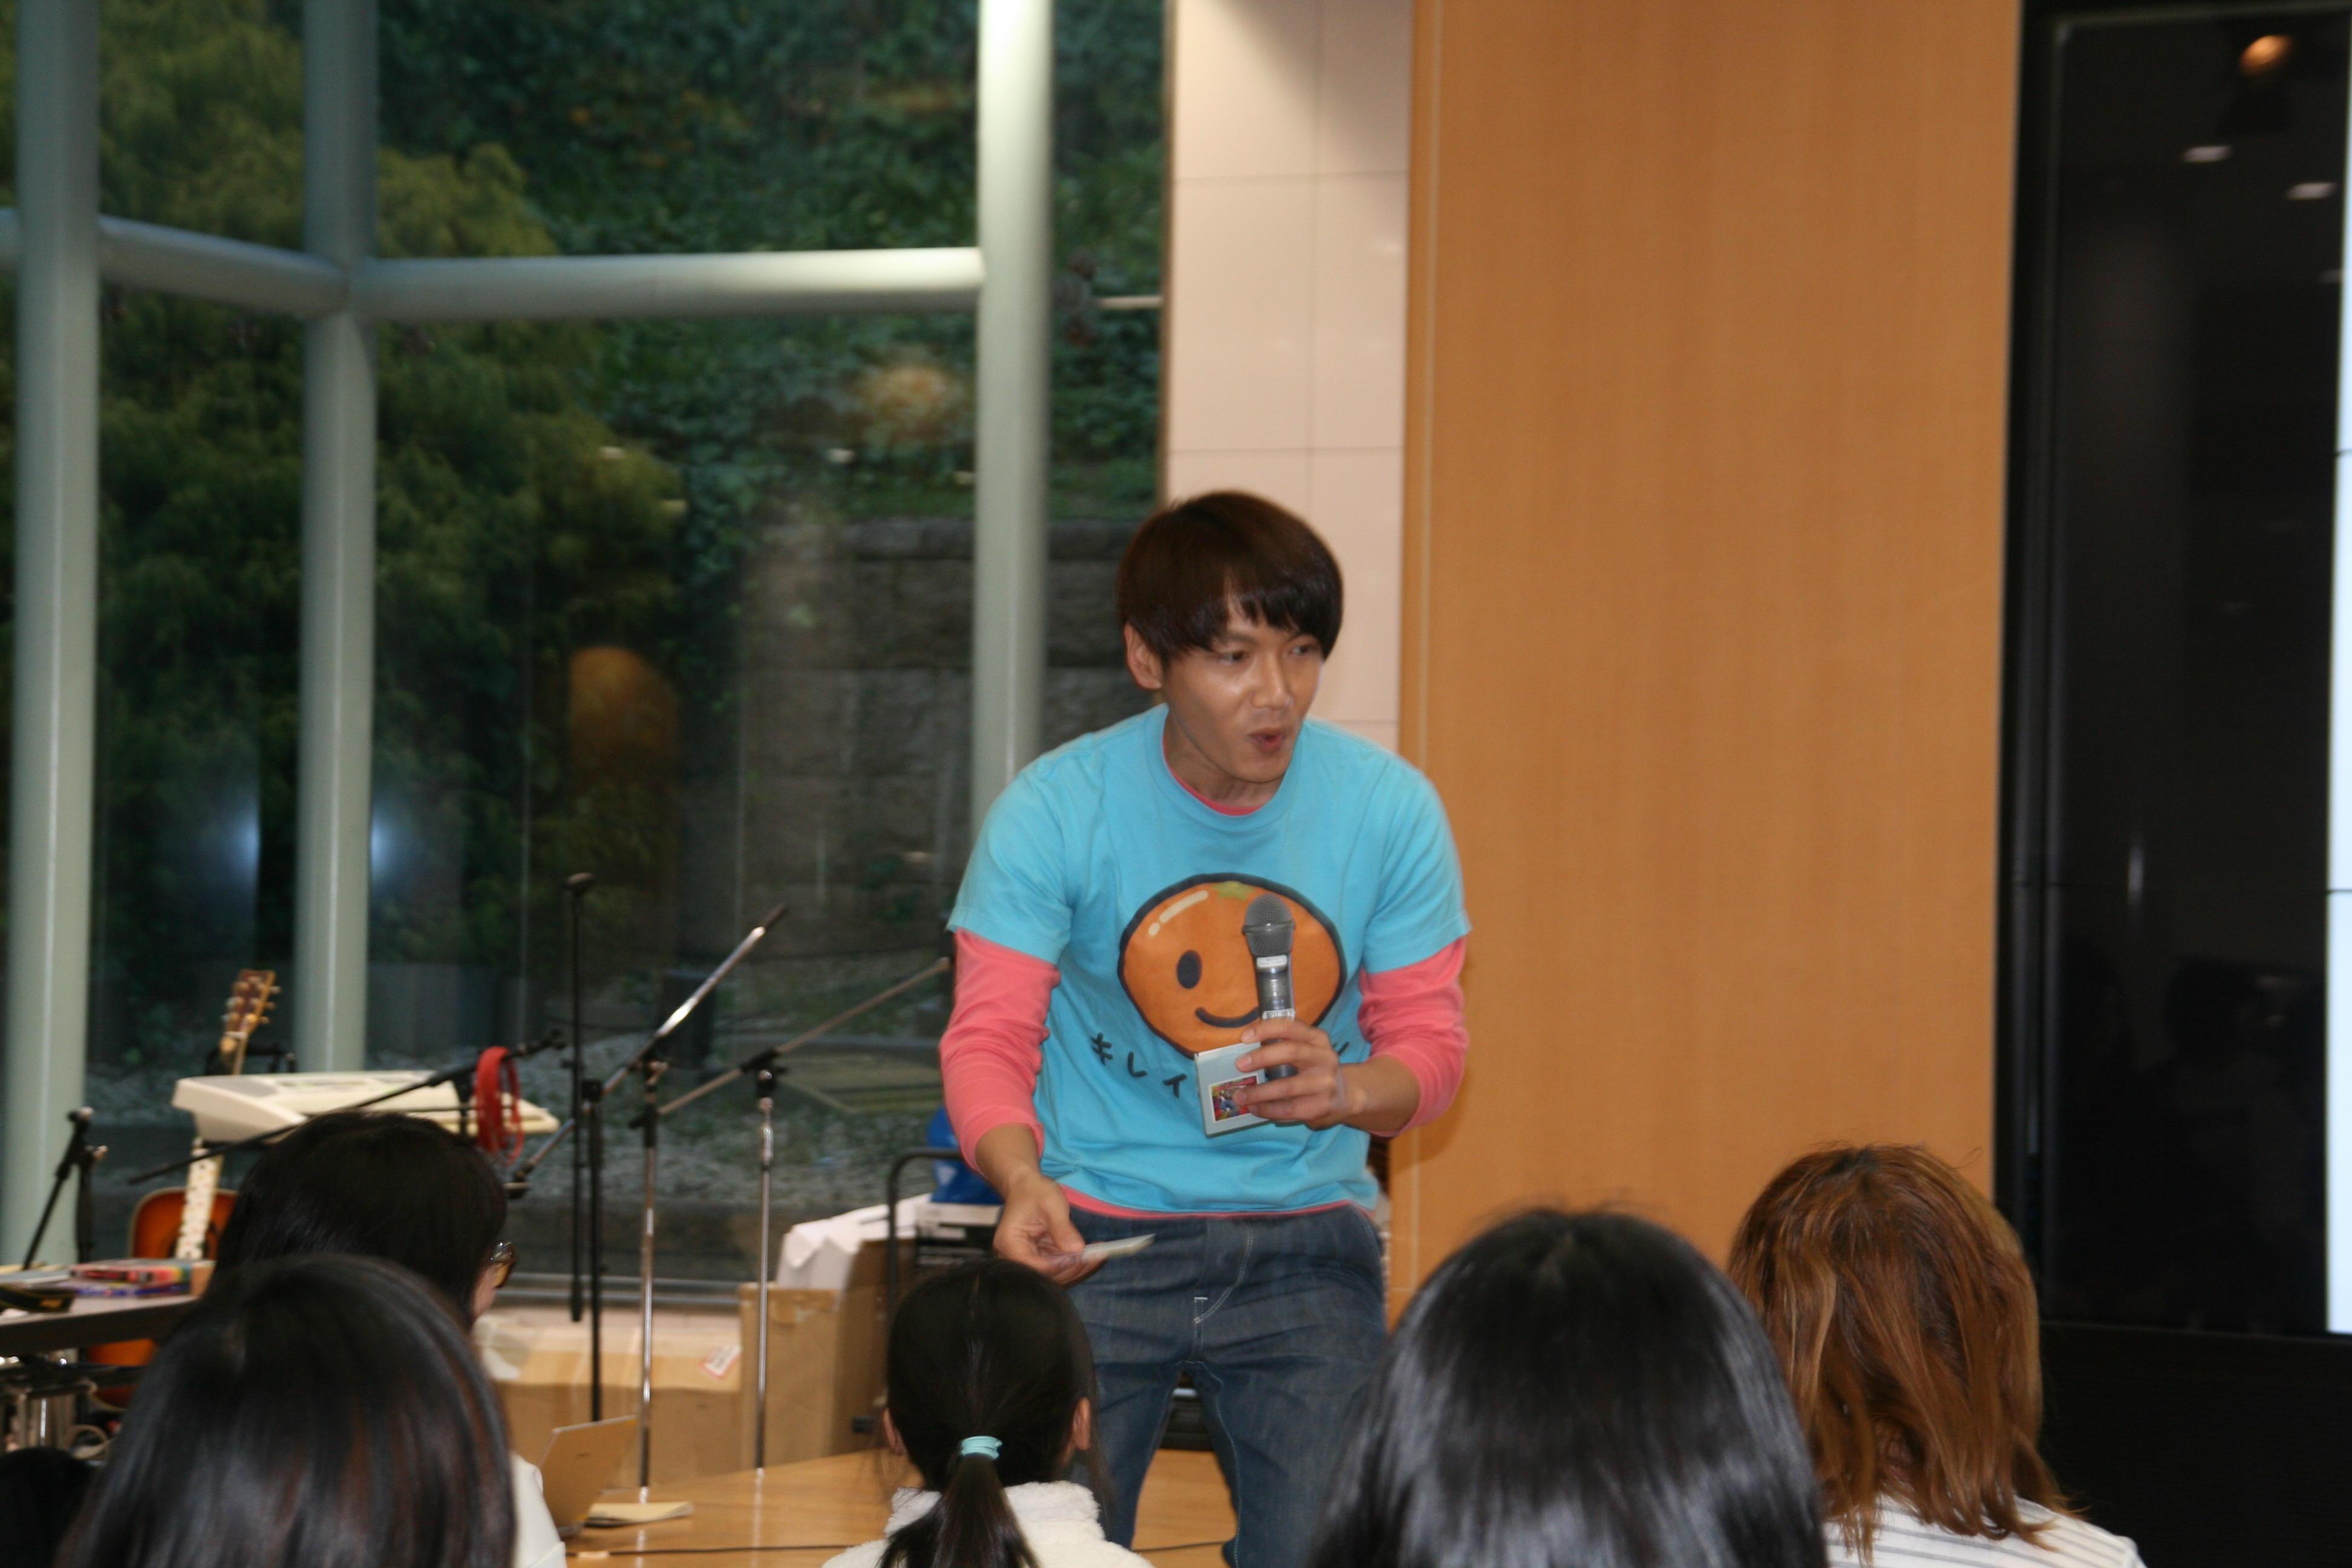 http://news.yoshimoto.co.jp/20180330233021-4797d9bbaf3eb6e5f5aef0f5984f3124f0ba6b06.jpg